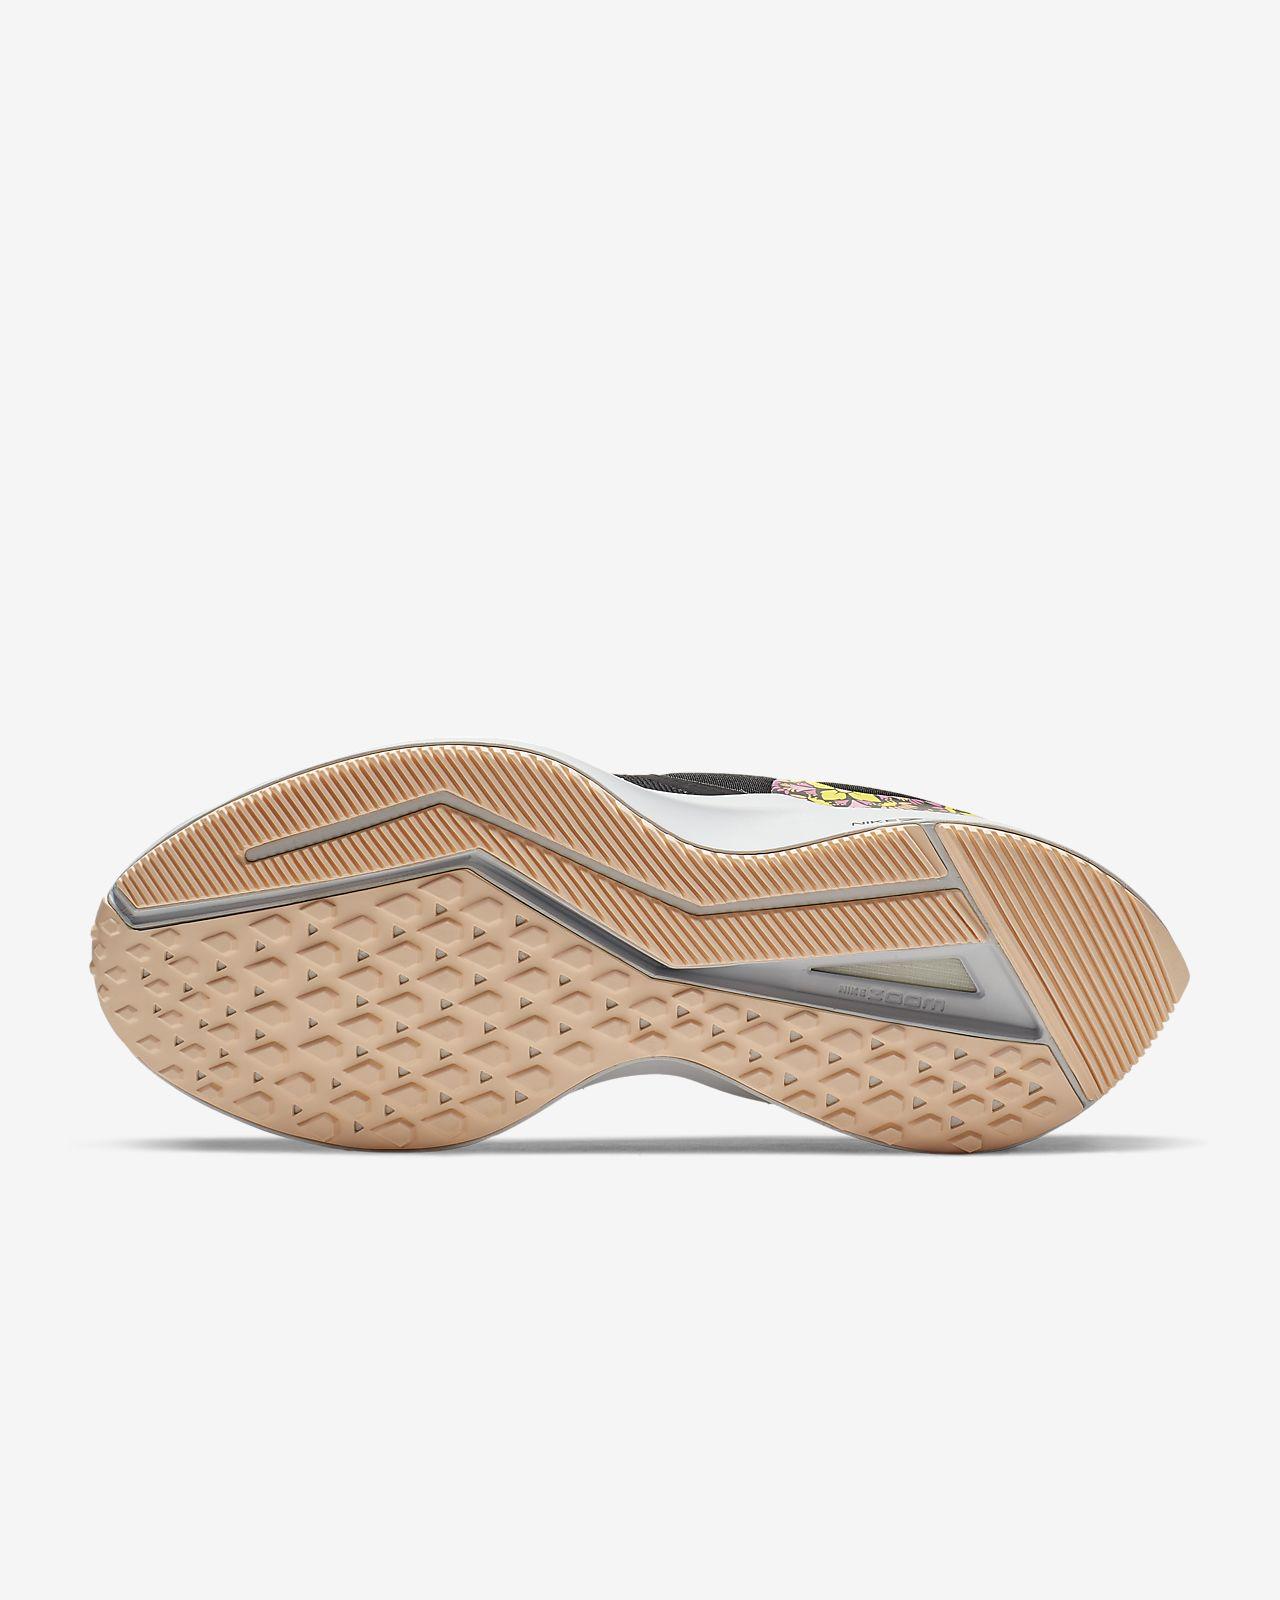 new style aa9bd c4361 ... Nike Air Zoom Winflo 6 SE Women s Running Shoe